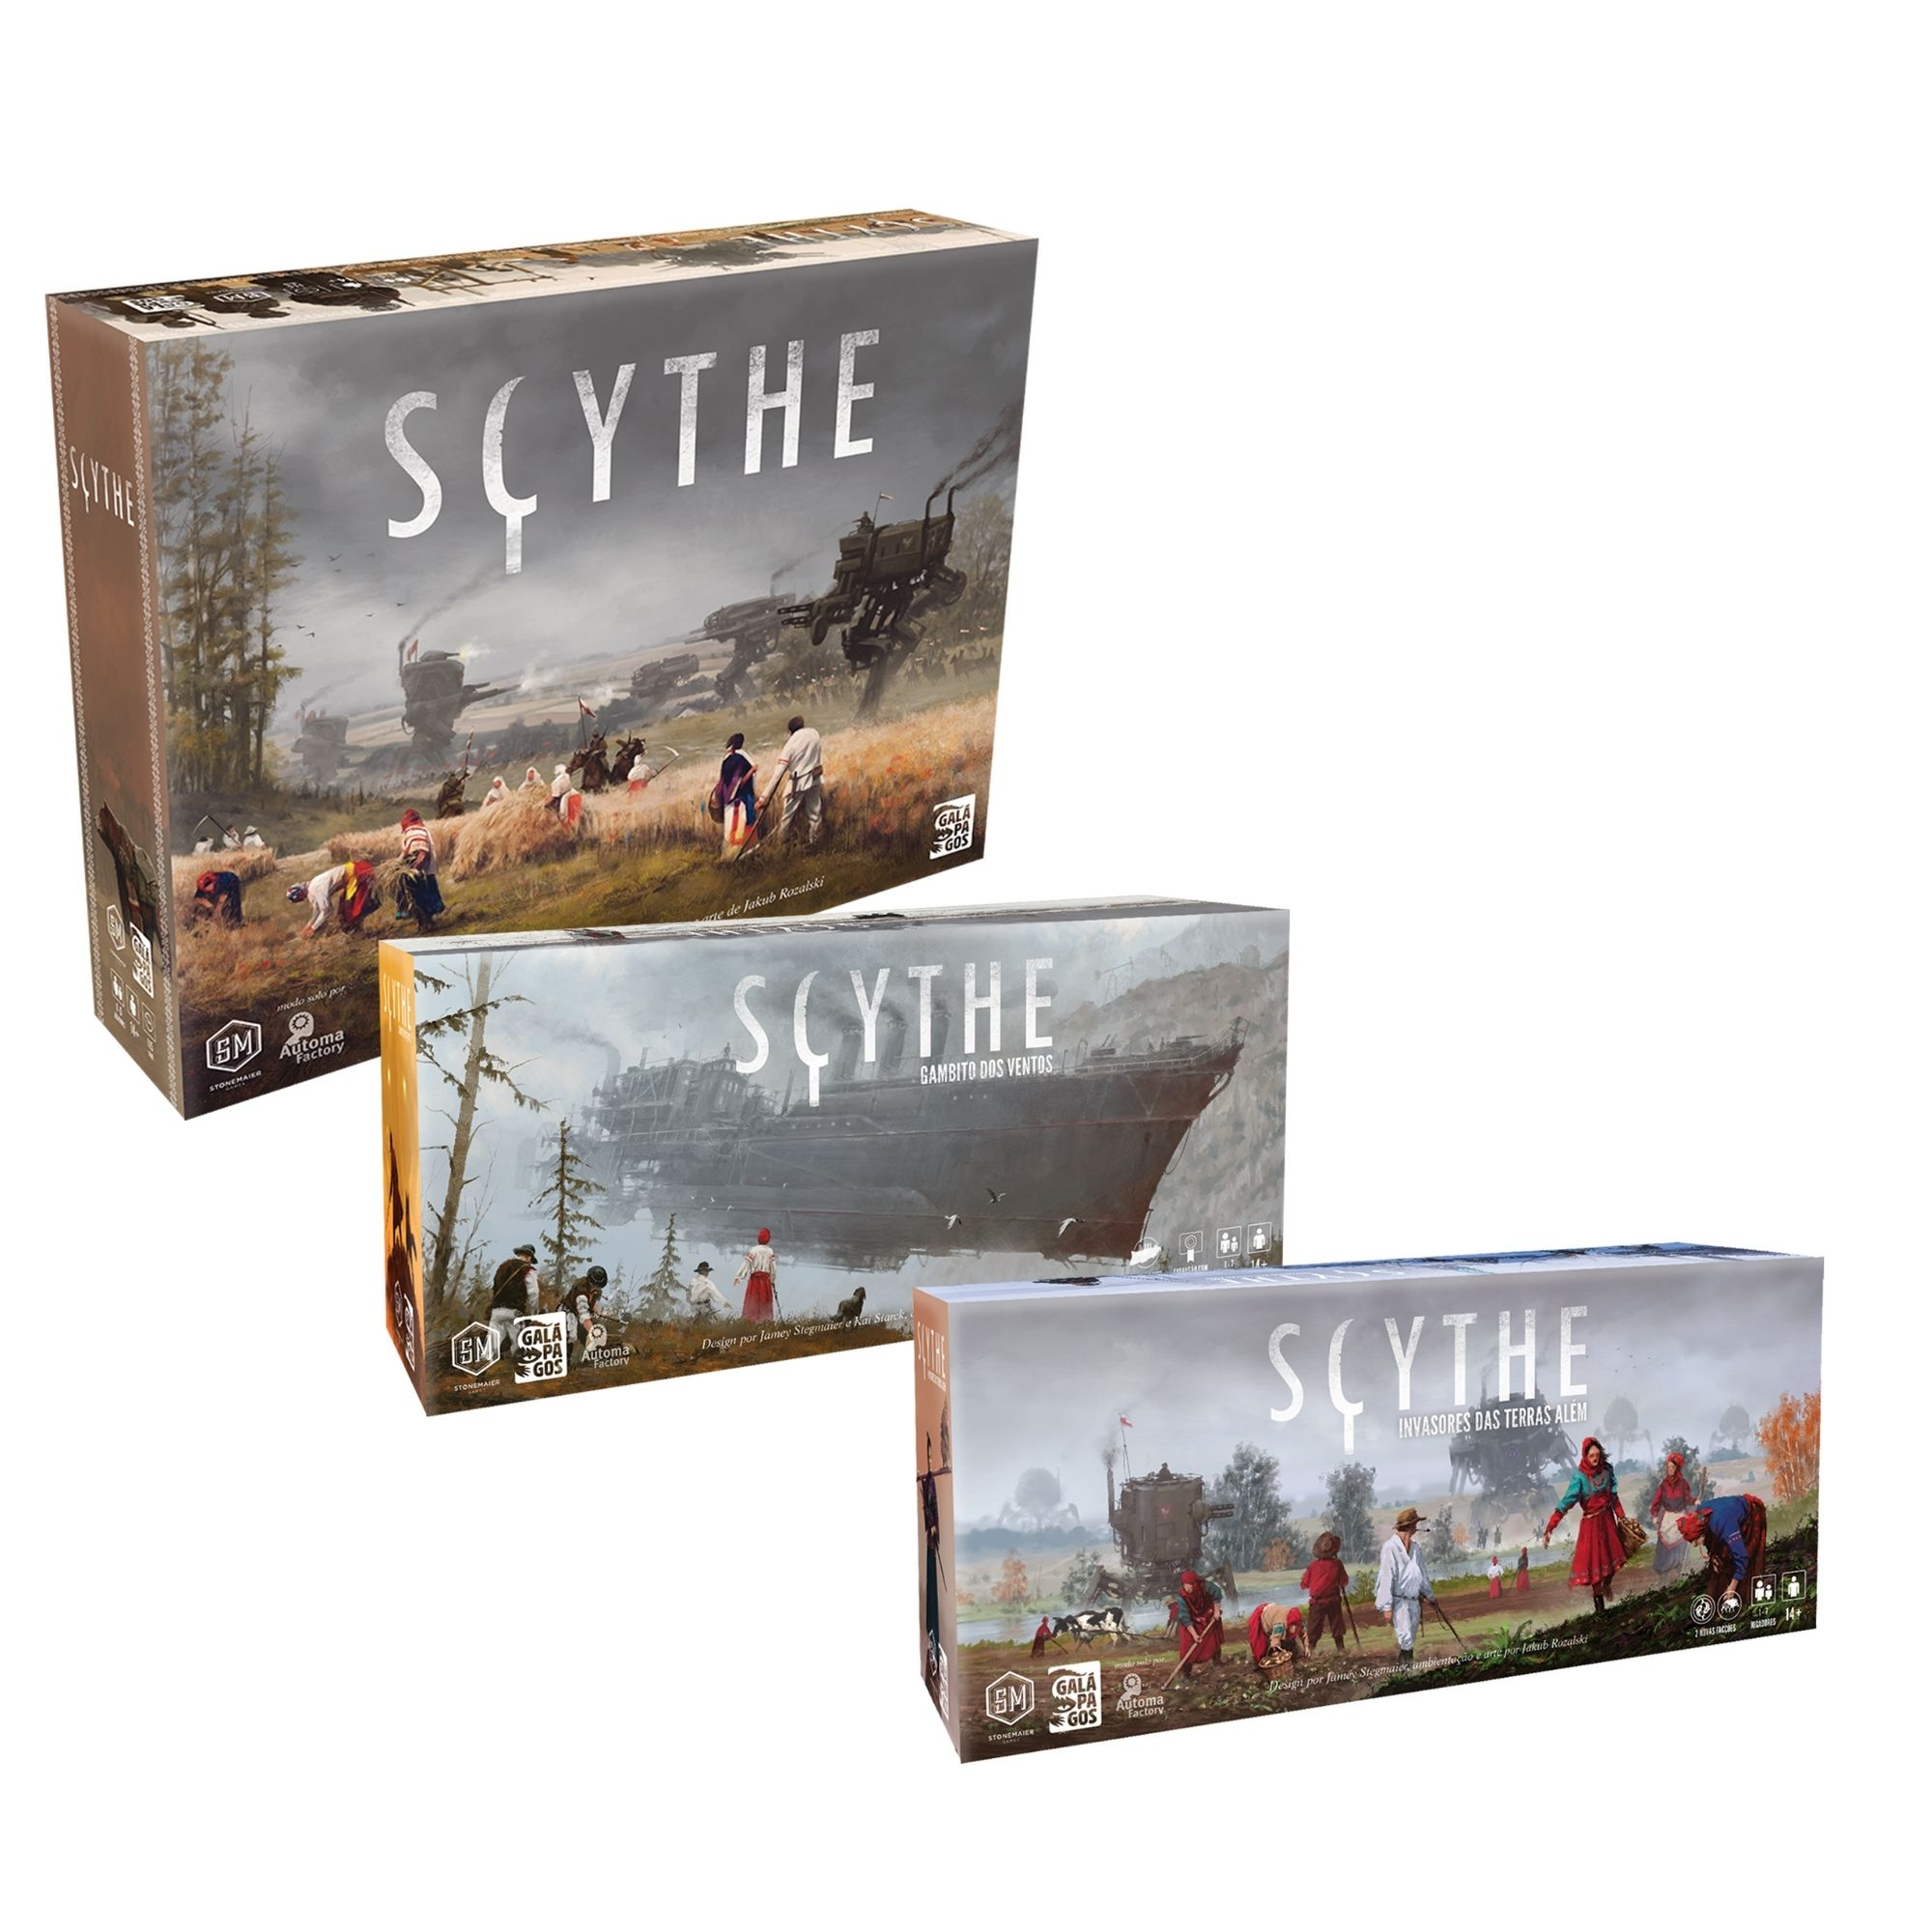 Kit Scythe + 2 Expansões